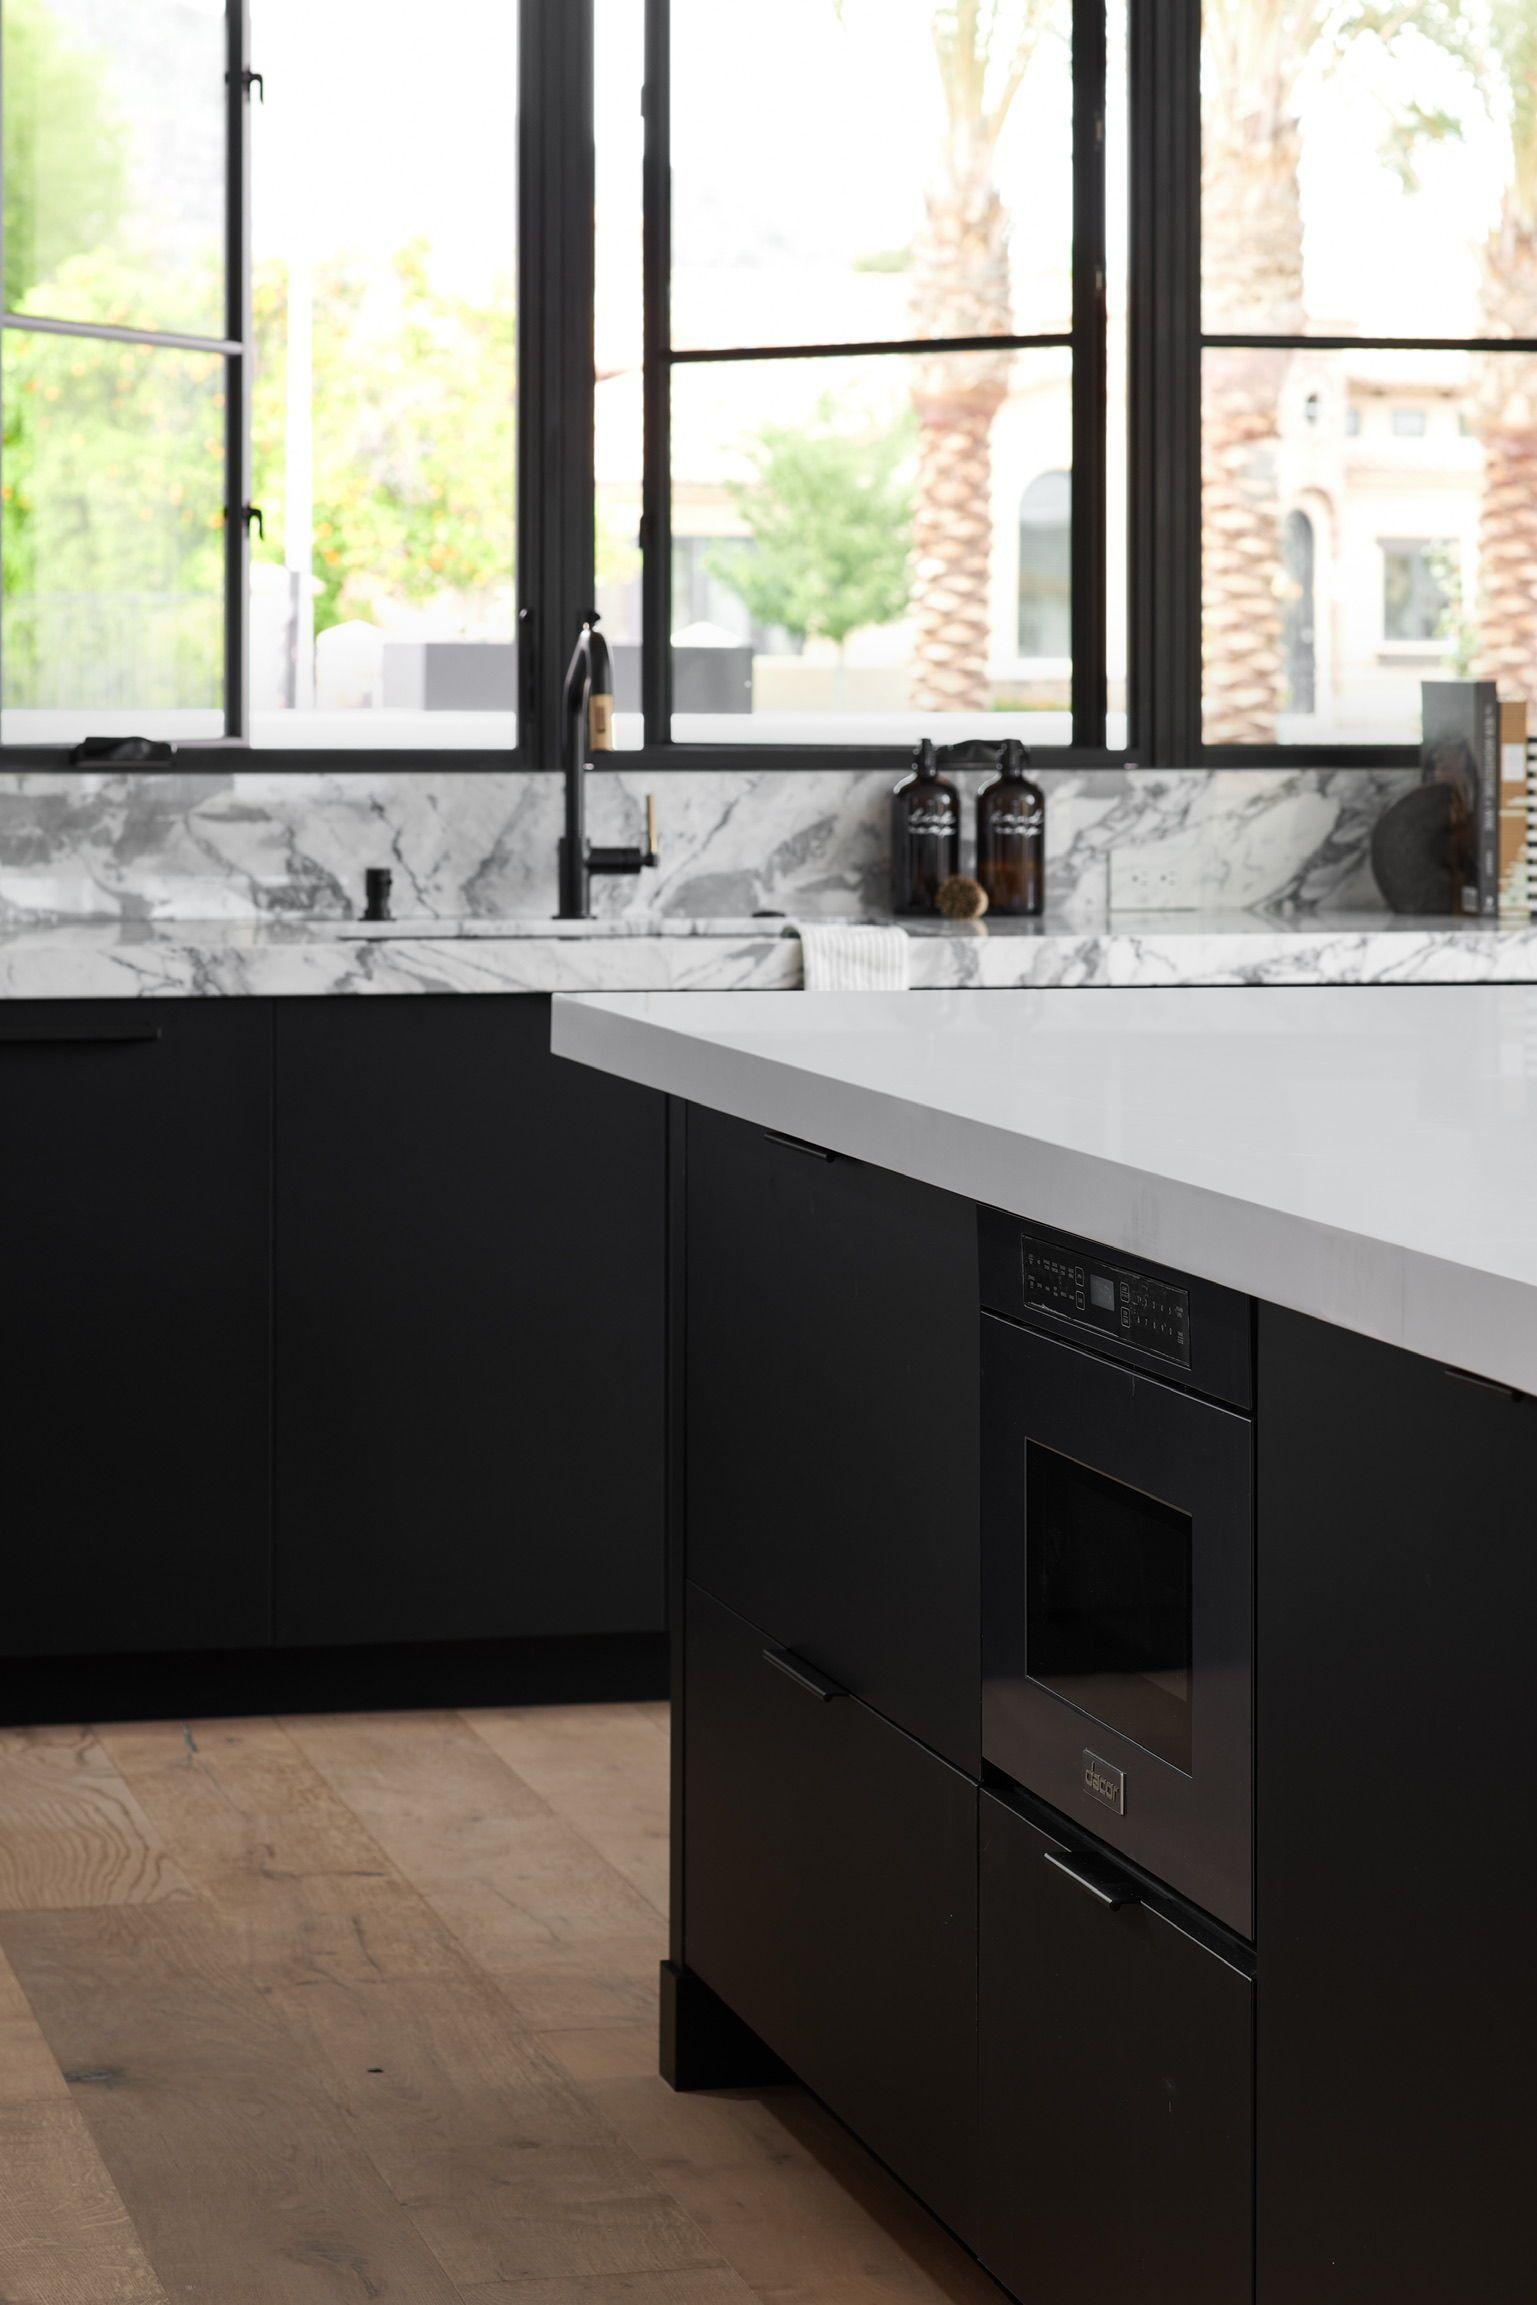 black kitchen cabinets with white countertops in 2020 modern black kitchen black kitchens on kitchen decor black countertop id=32079